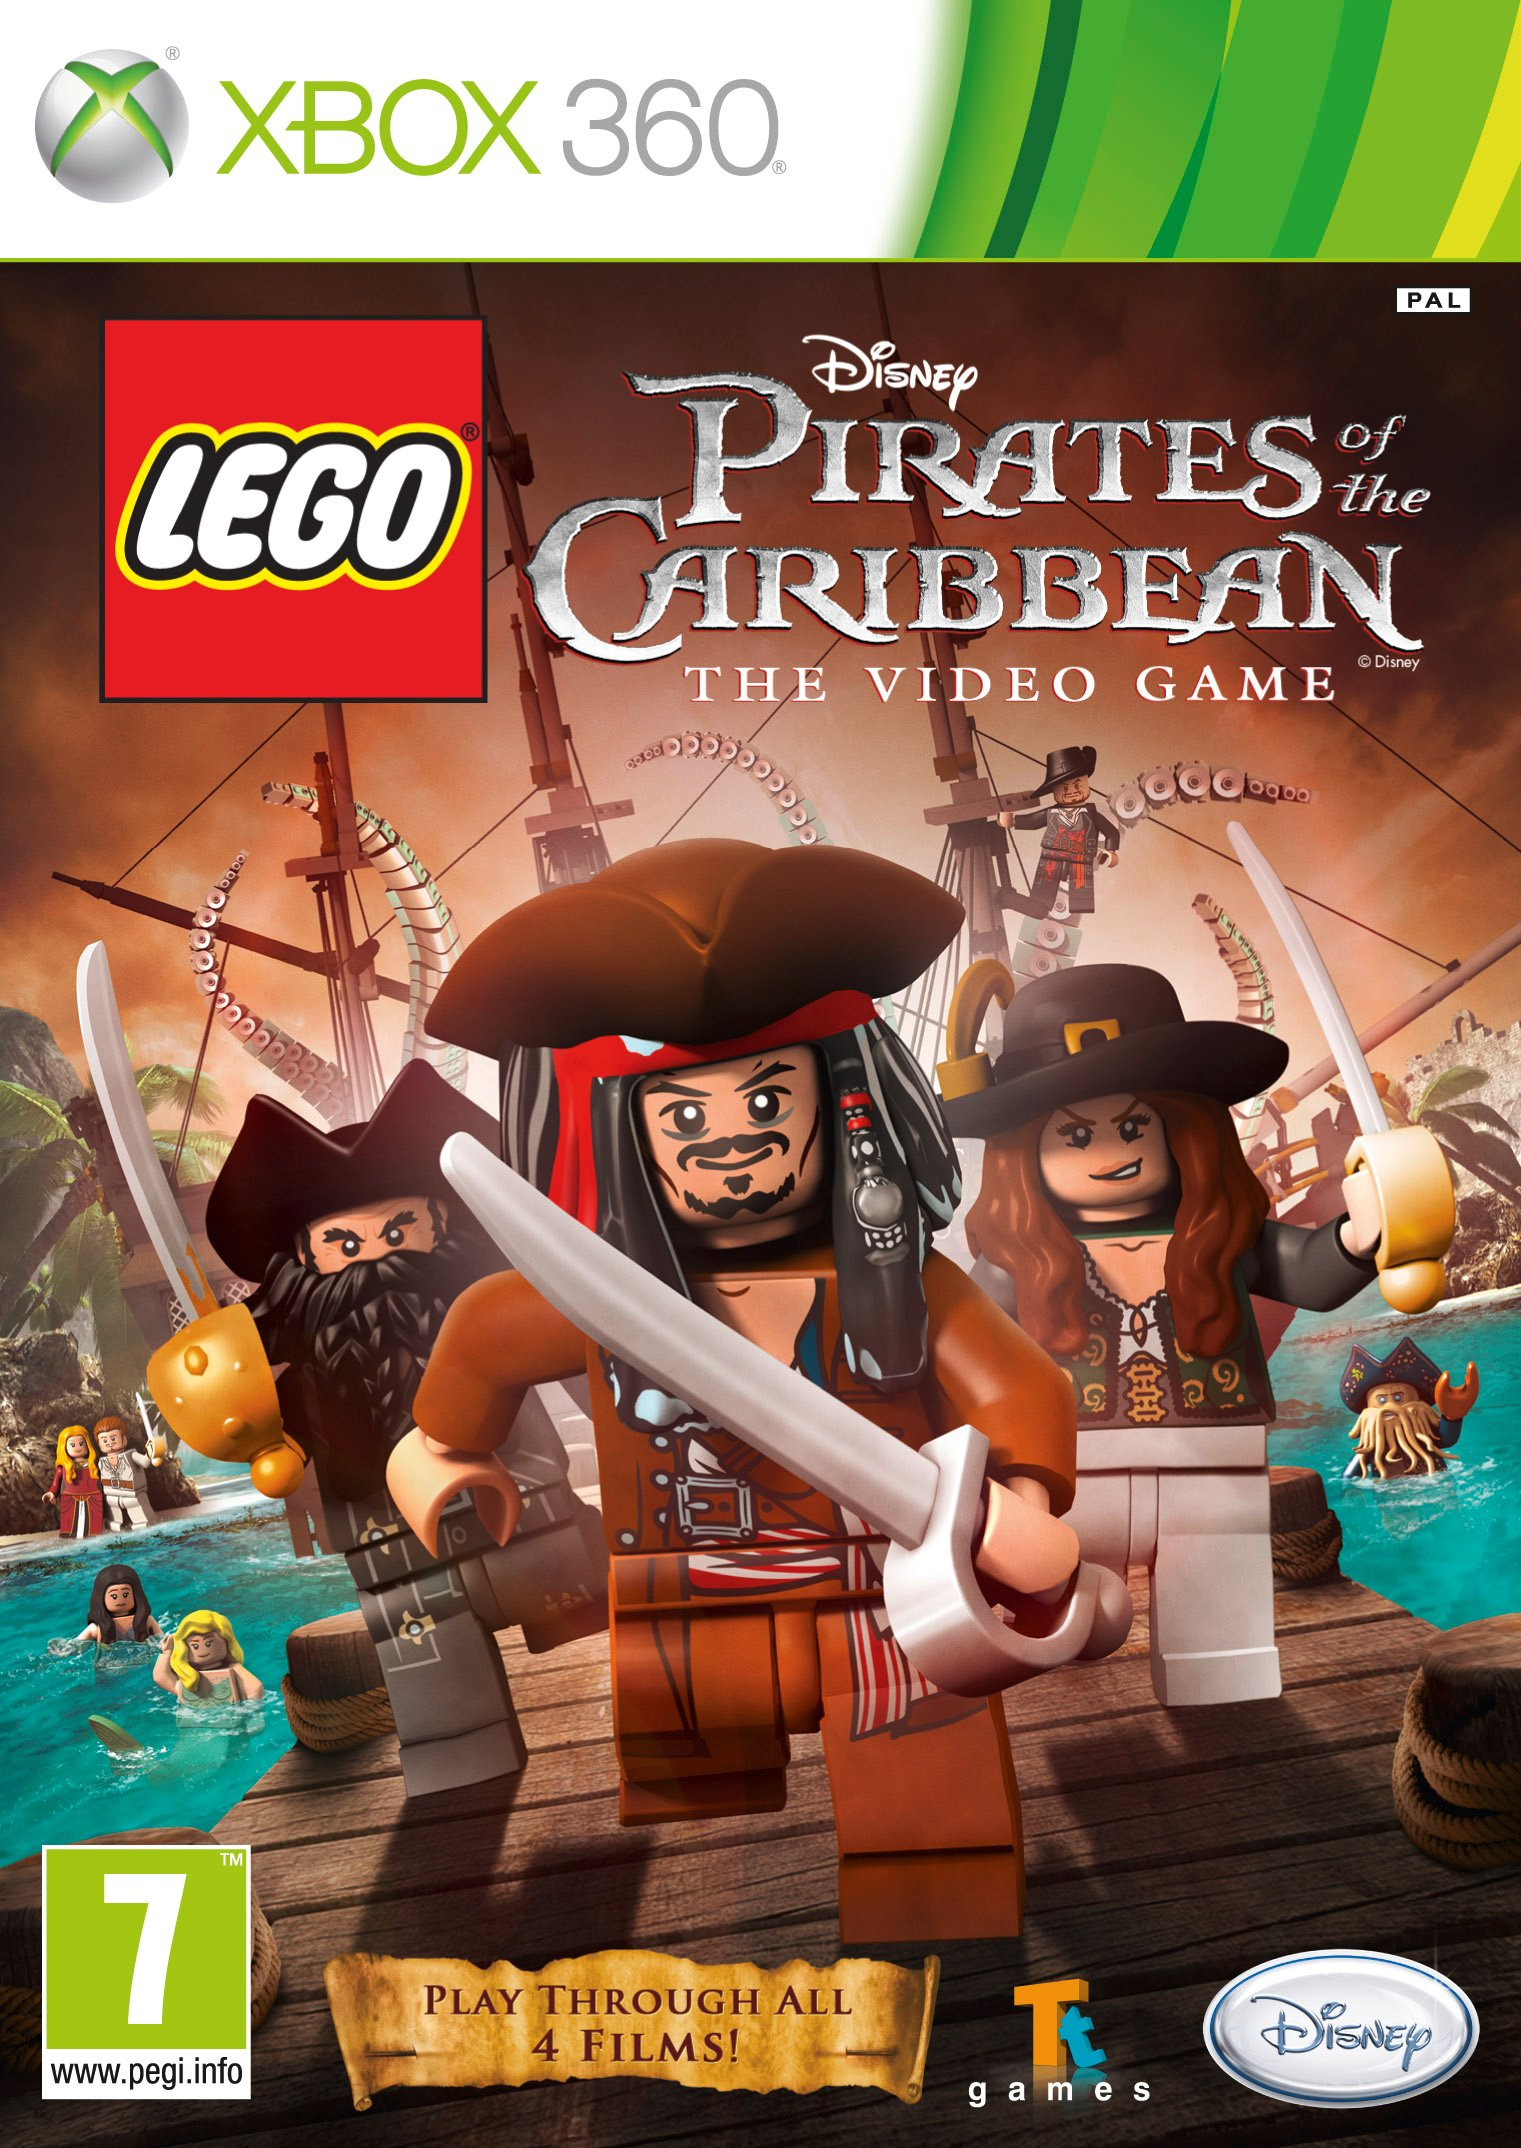 Pirati Dei Caraibi Xbox 360 Pirati Dei Caraibi Xbox